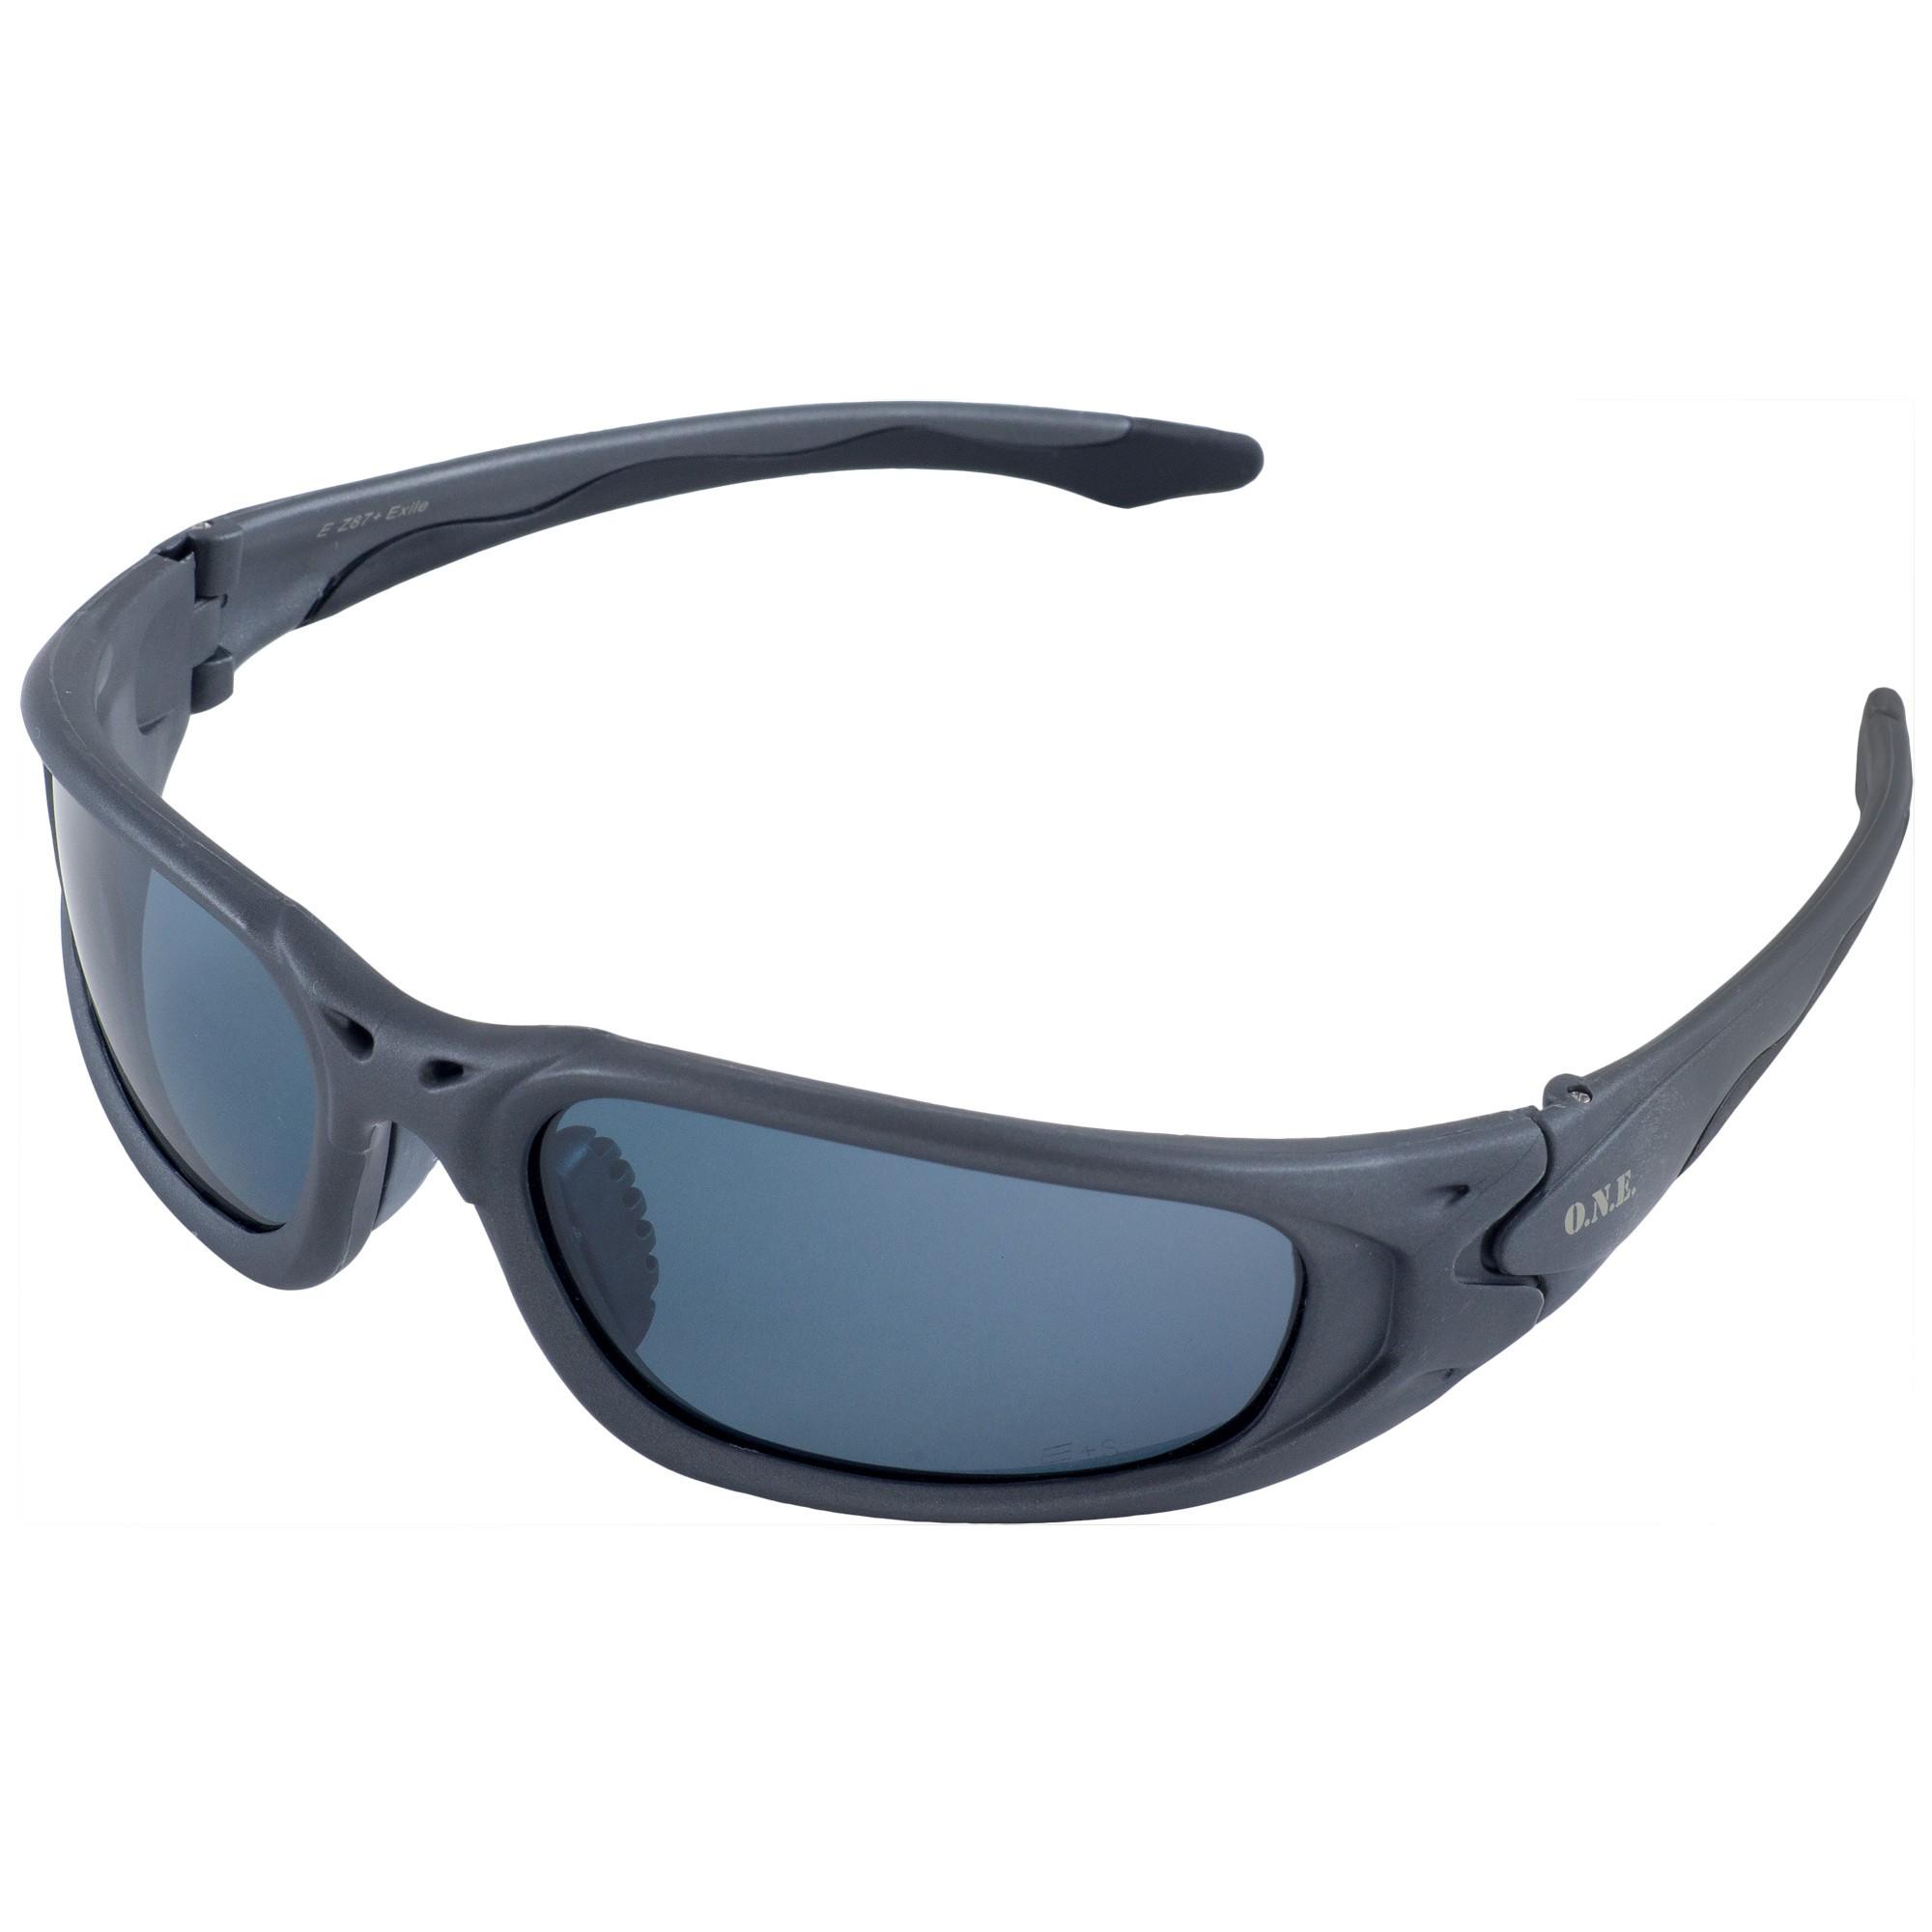 erb 18019 one nation exile safety glasses gray frame